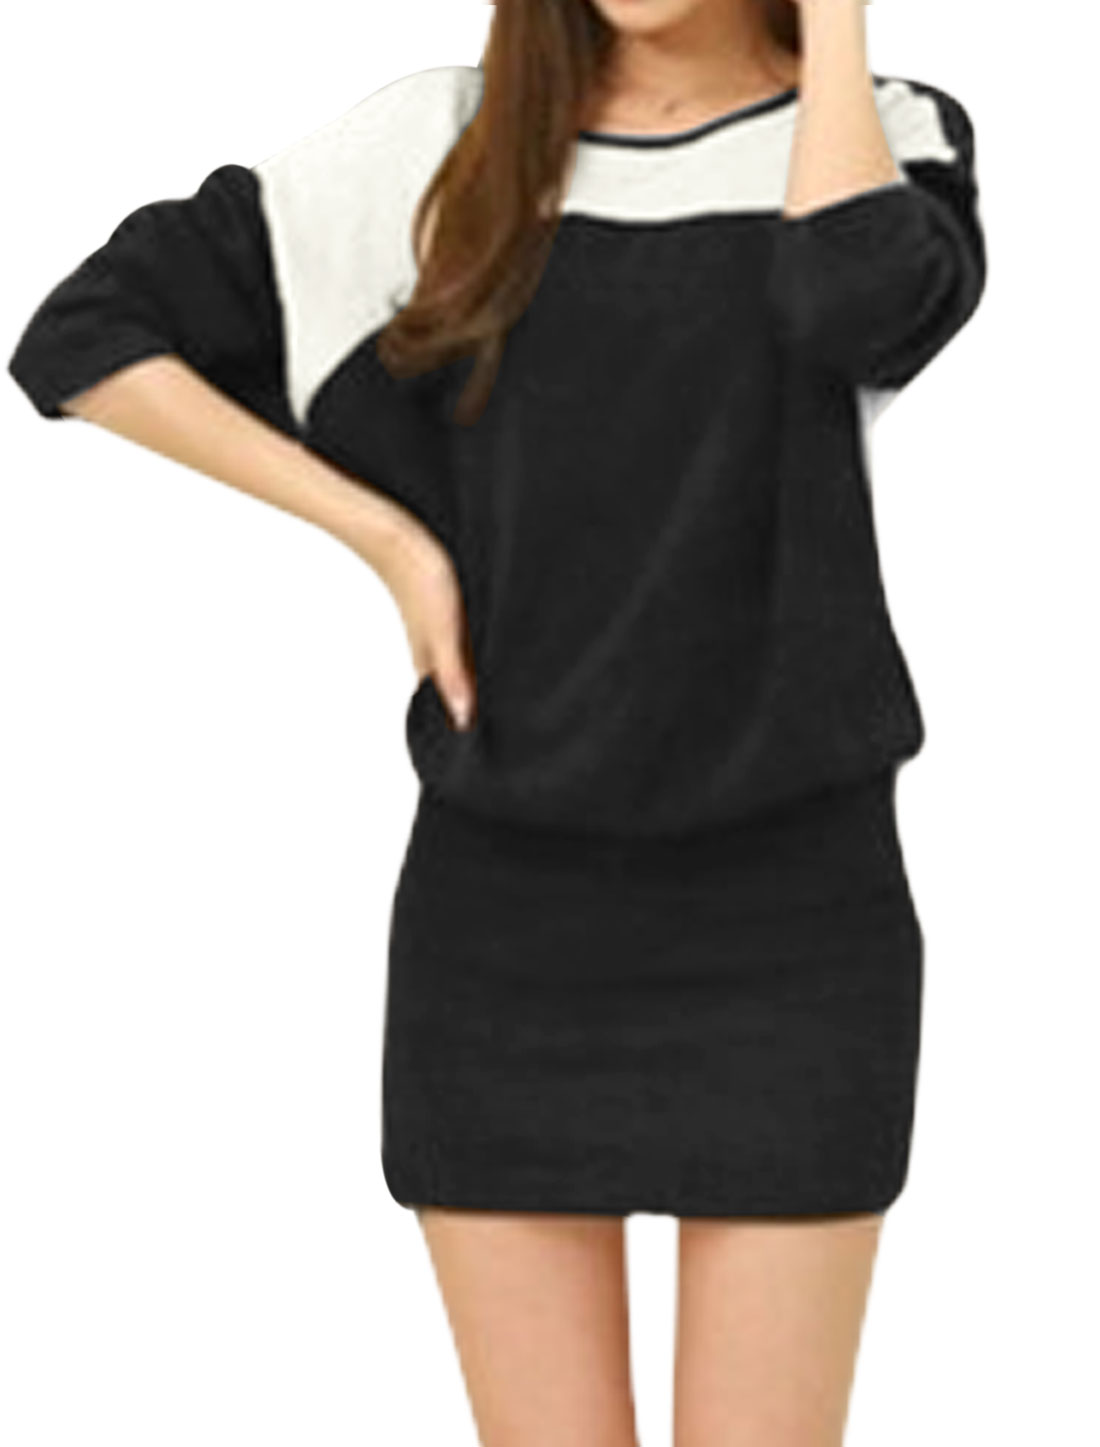 Ladies Round Neck Long Dolman Sleeves Casual Blouson Dress Black M